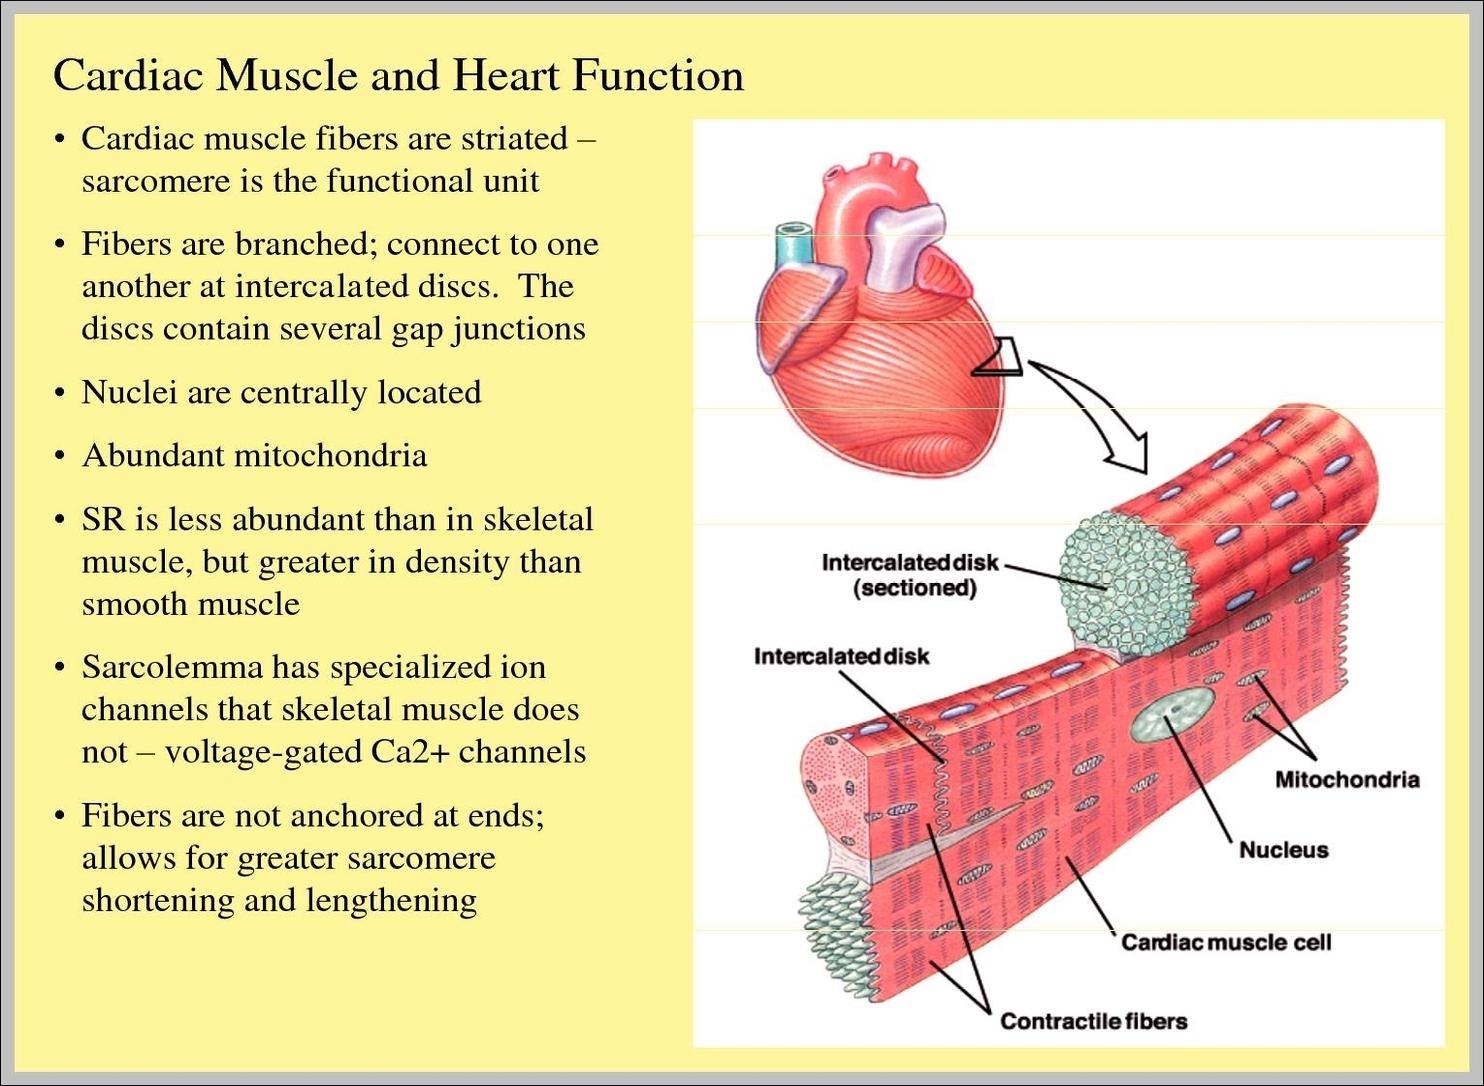 cardiac muscle tissue diagram labeled elan volume control wiring function graph